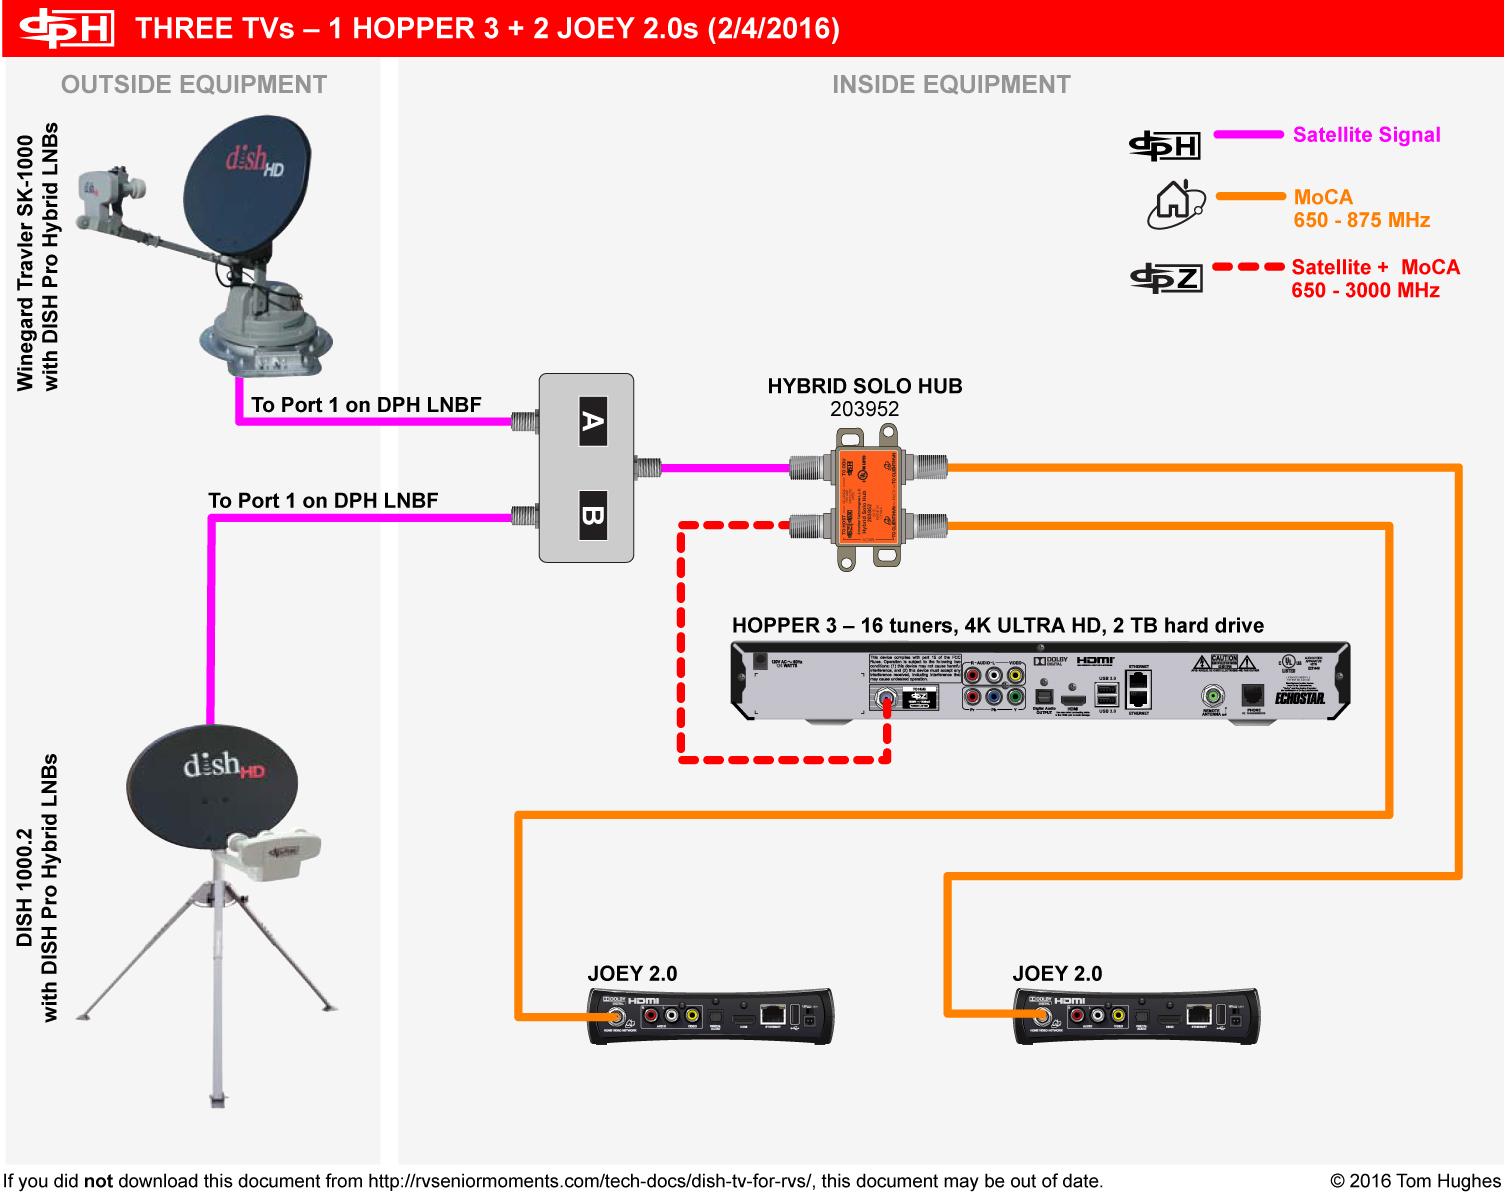 hopper3rv_00_threetvs hopper3 joeys?resize\=840%2C668 dish network satellite wiring diagram gandul 45 77 79 119  at webbmarketing.co